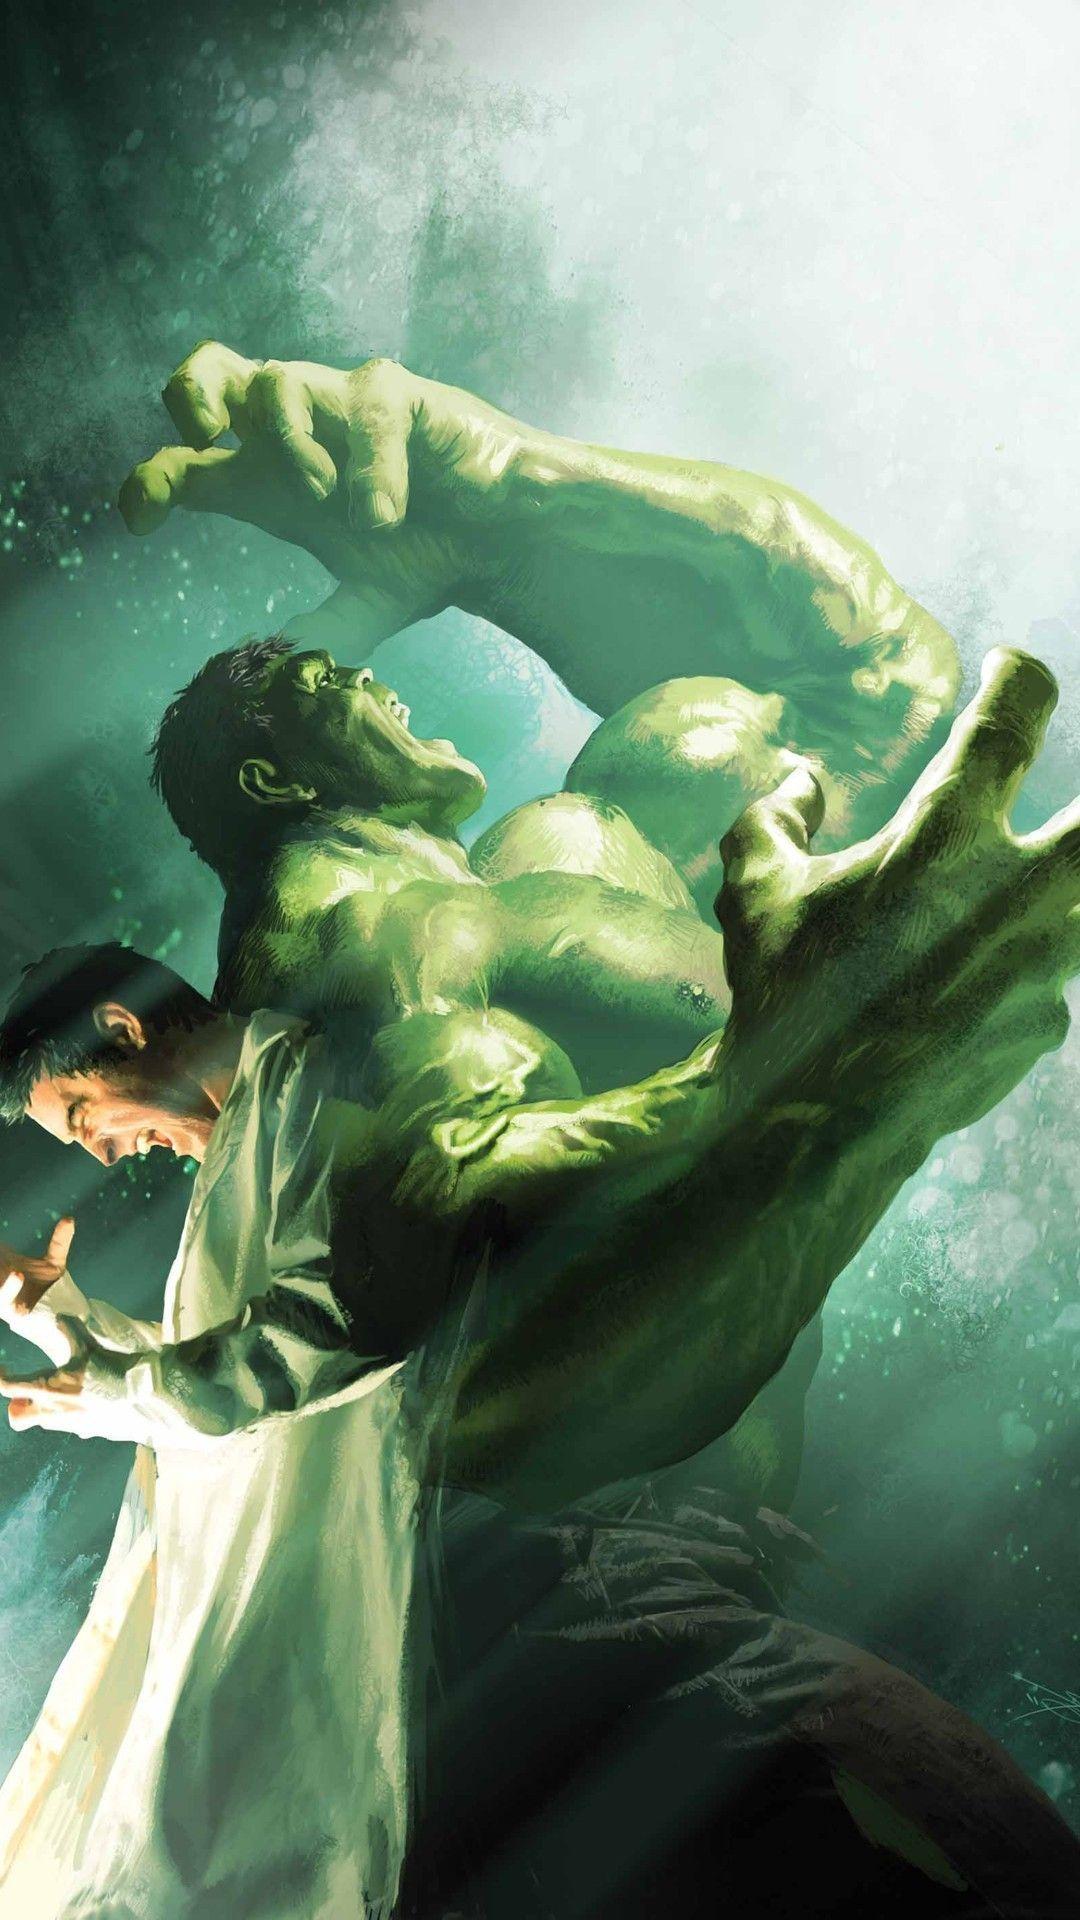 Hulk Wallpaper Free for iPhone Mobile 1. Hulk art, Hulk